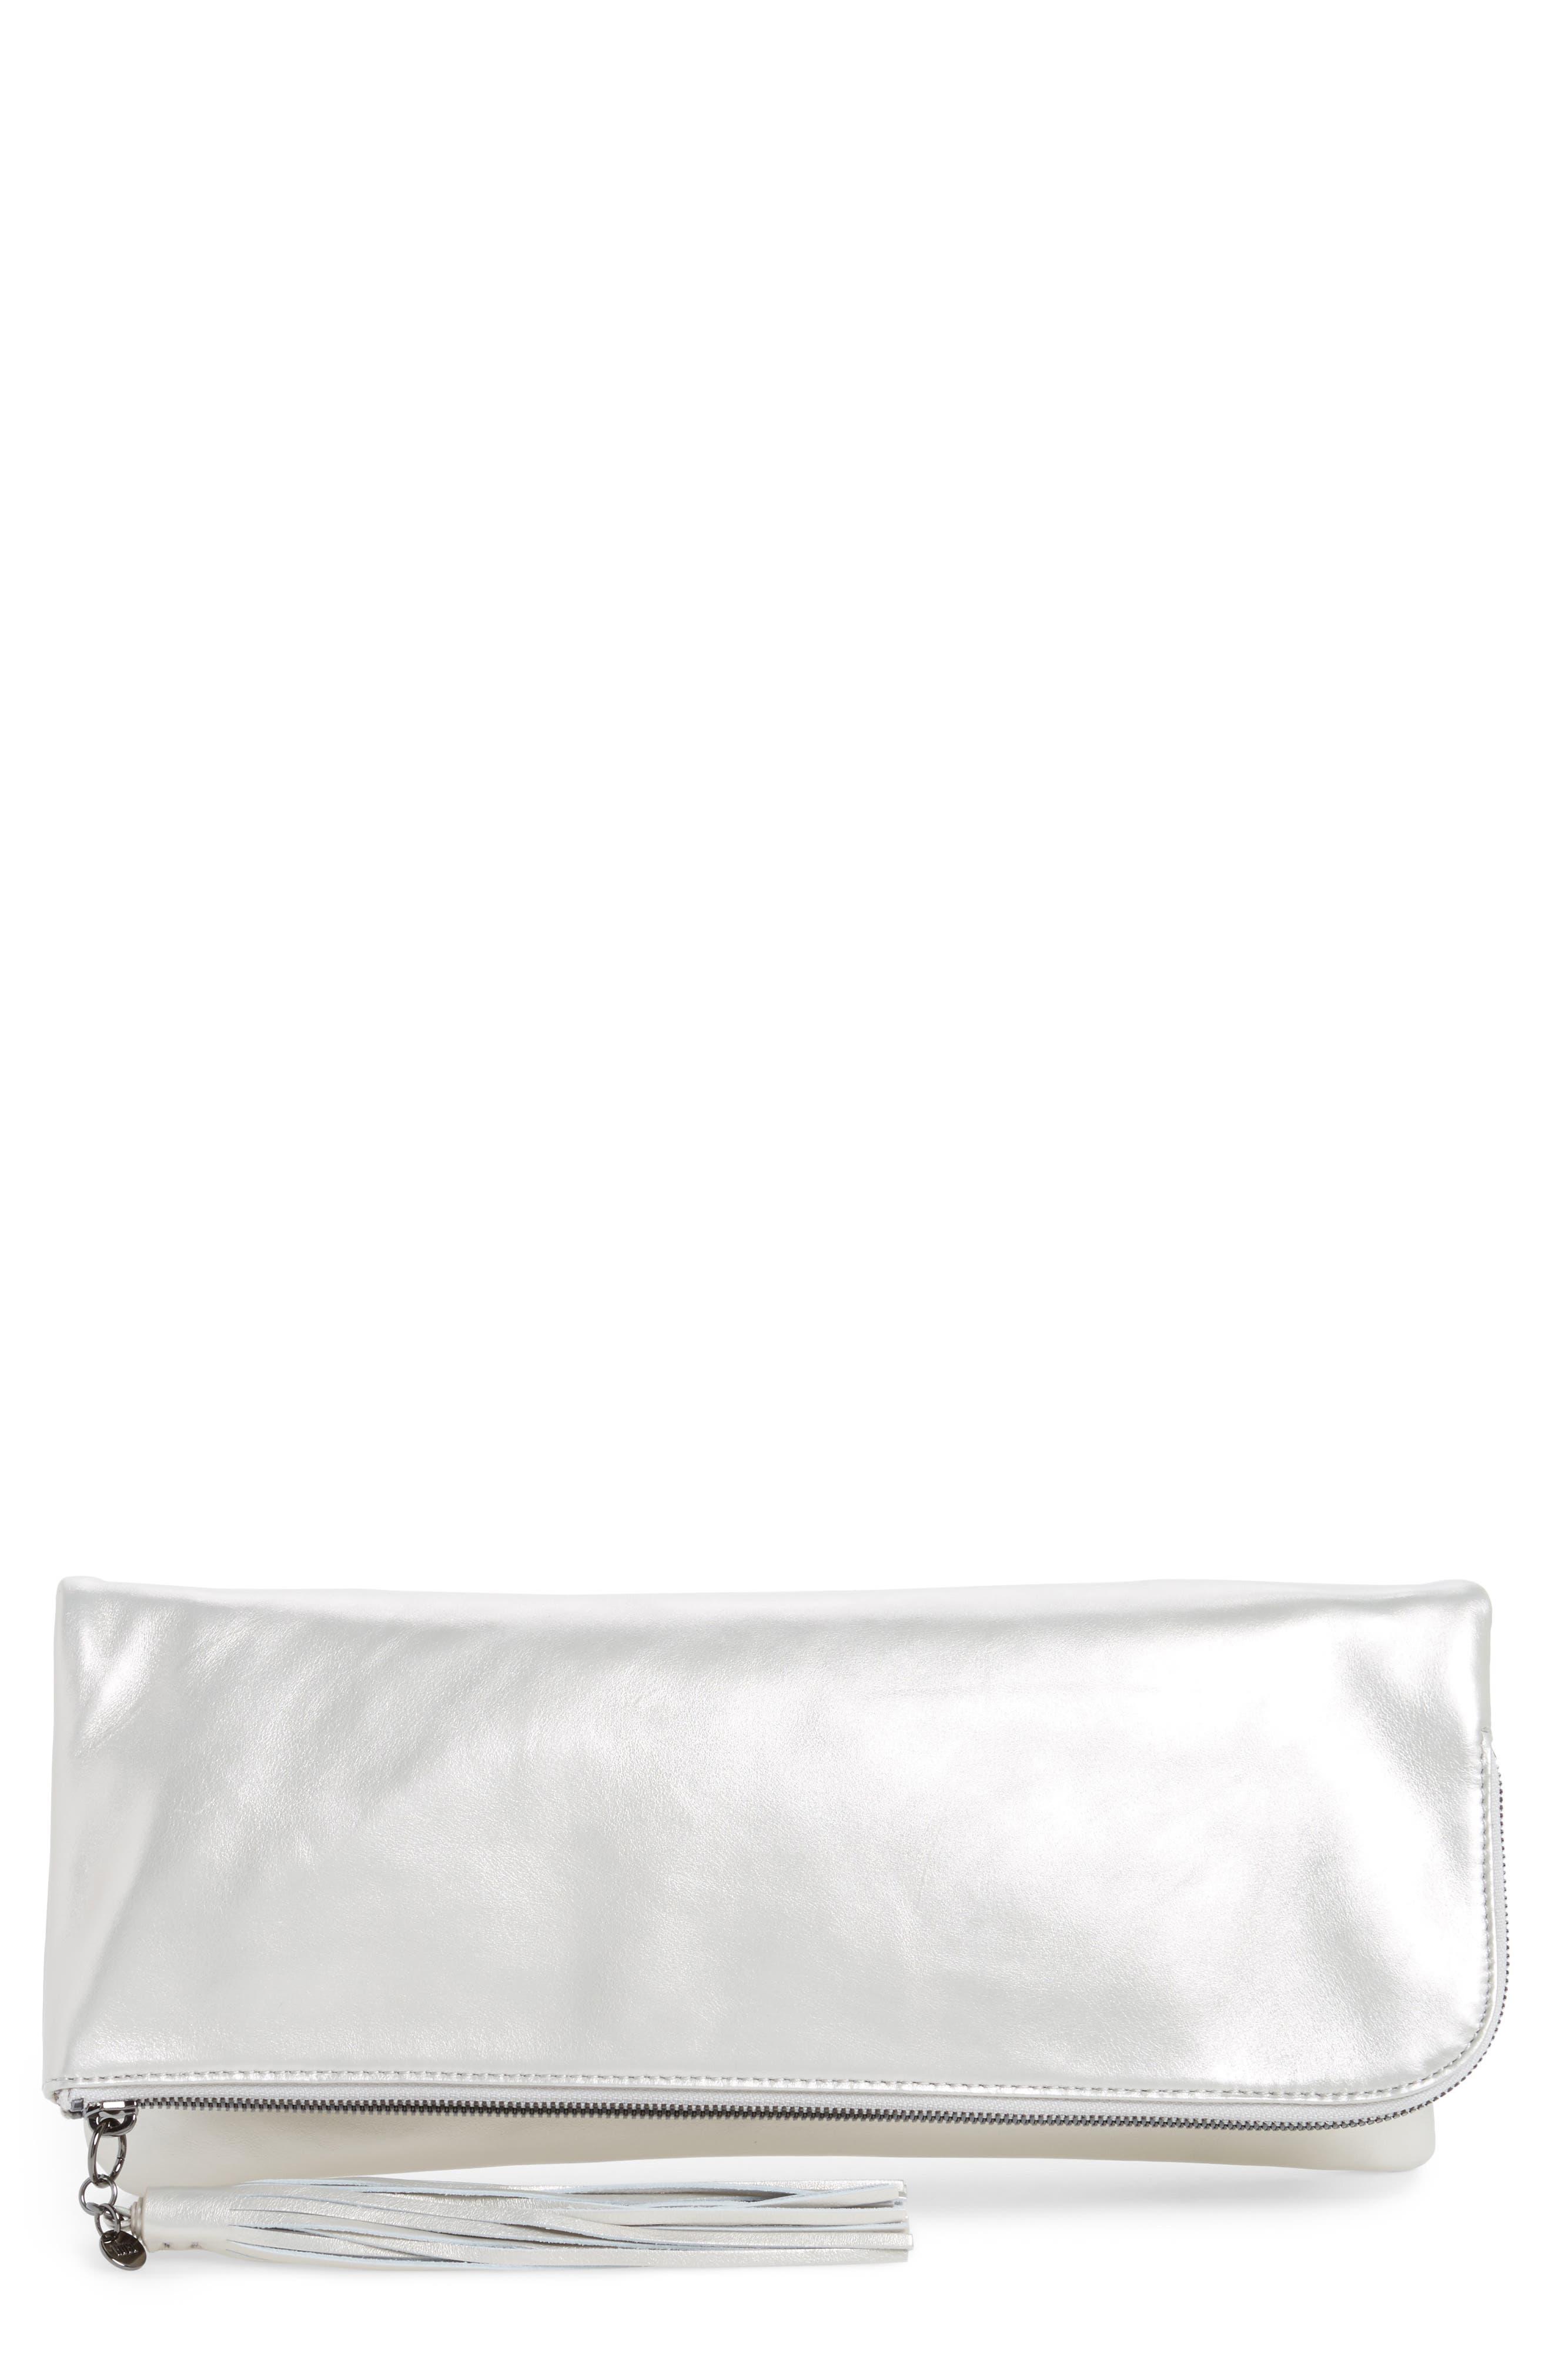 Main Image - Hobo Raine Calfskin Leather Foldover Clutch